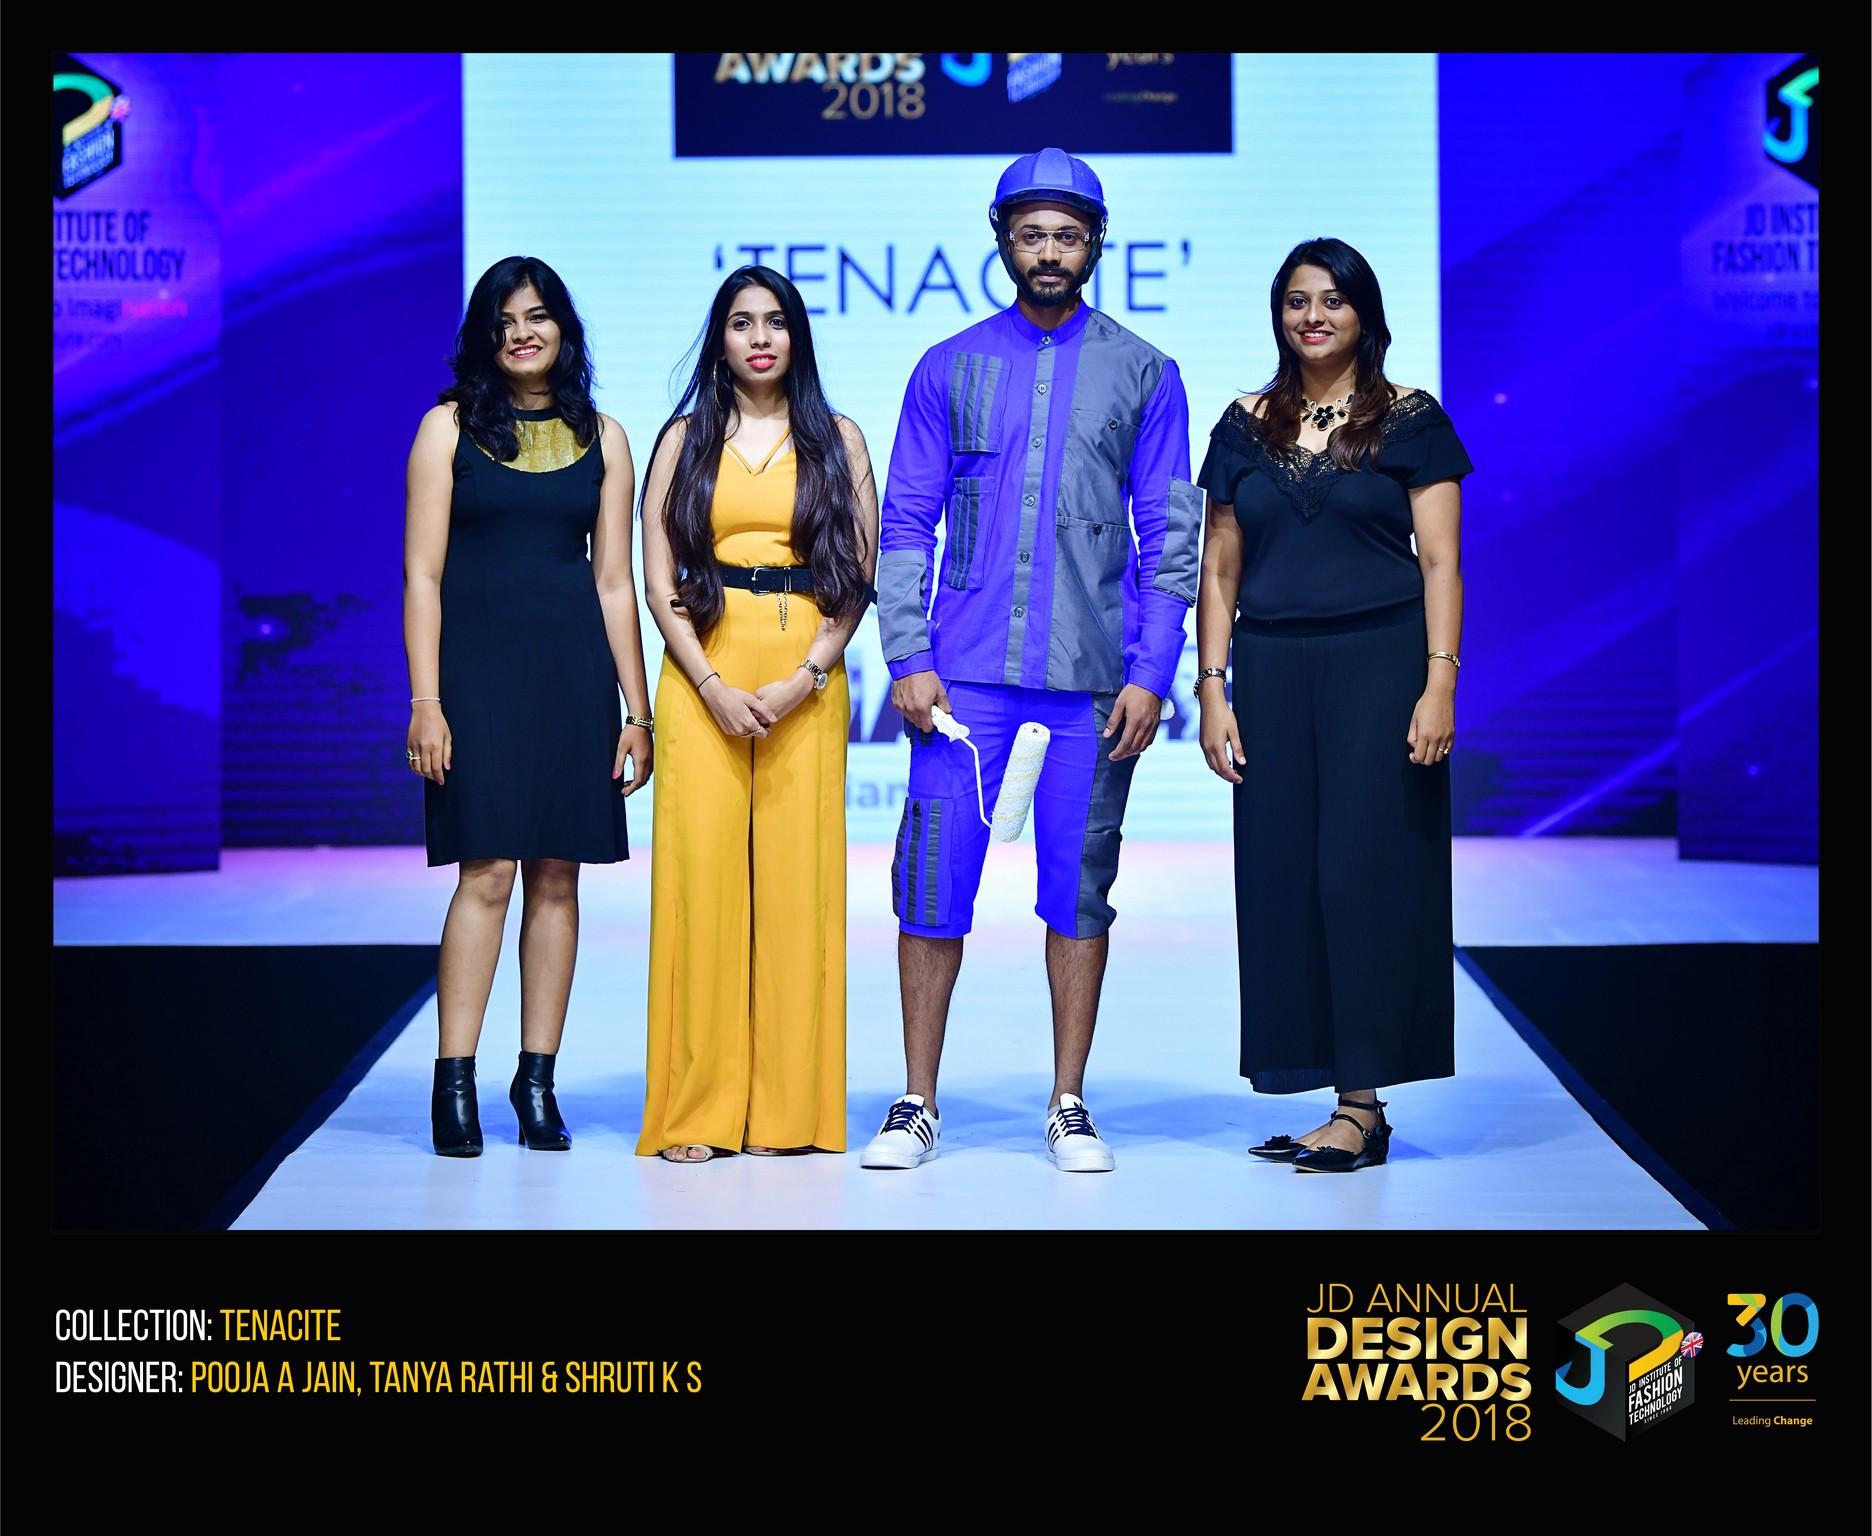 Tenacite – Change – JD Annual Design Awards 2018 | Designer: Tanya, Pooja and Shruti | Photography : Jerin Nath (@jerin_nath) tenacite – change – jd annual design awards 2018 - TENACITE 8 - Tenacite – Change – JD Annual Design Awards 2018